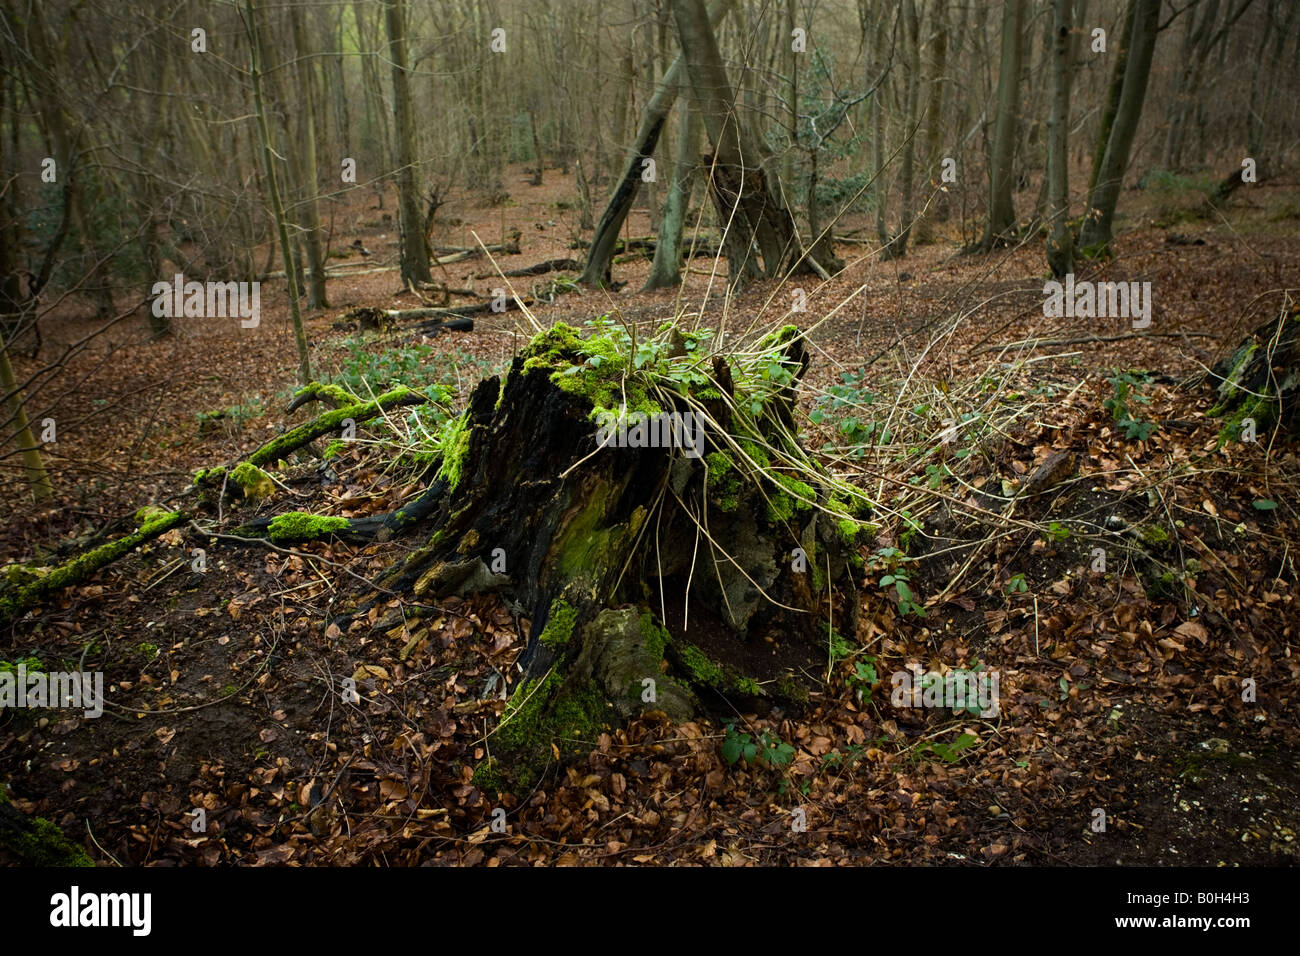 Woodland forest near Medmenham, Buckinghamshire, England. Stock Photo